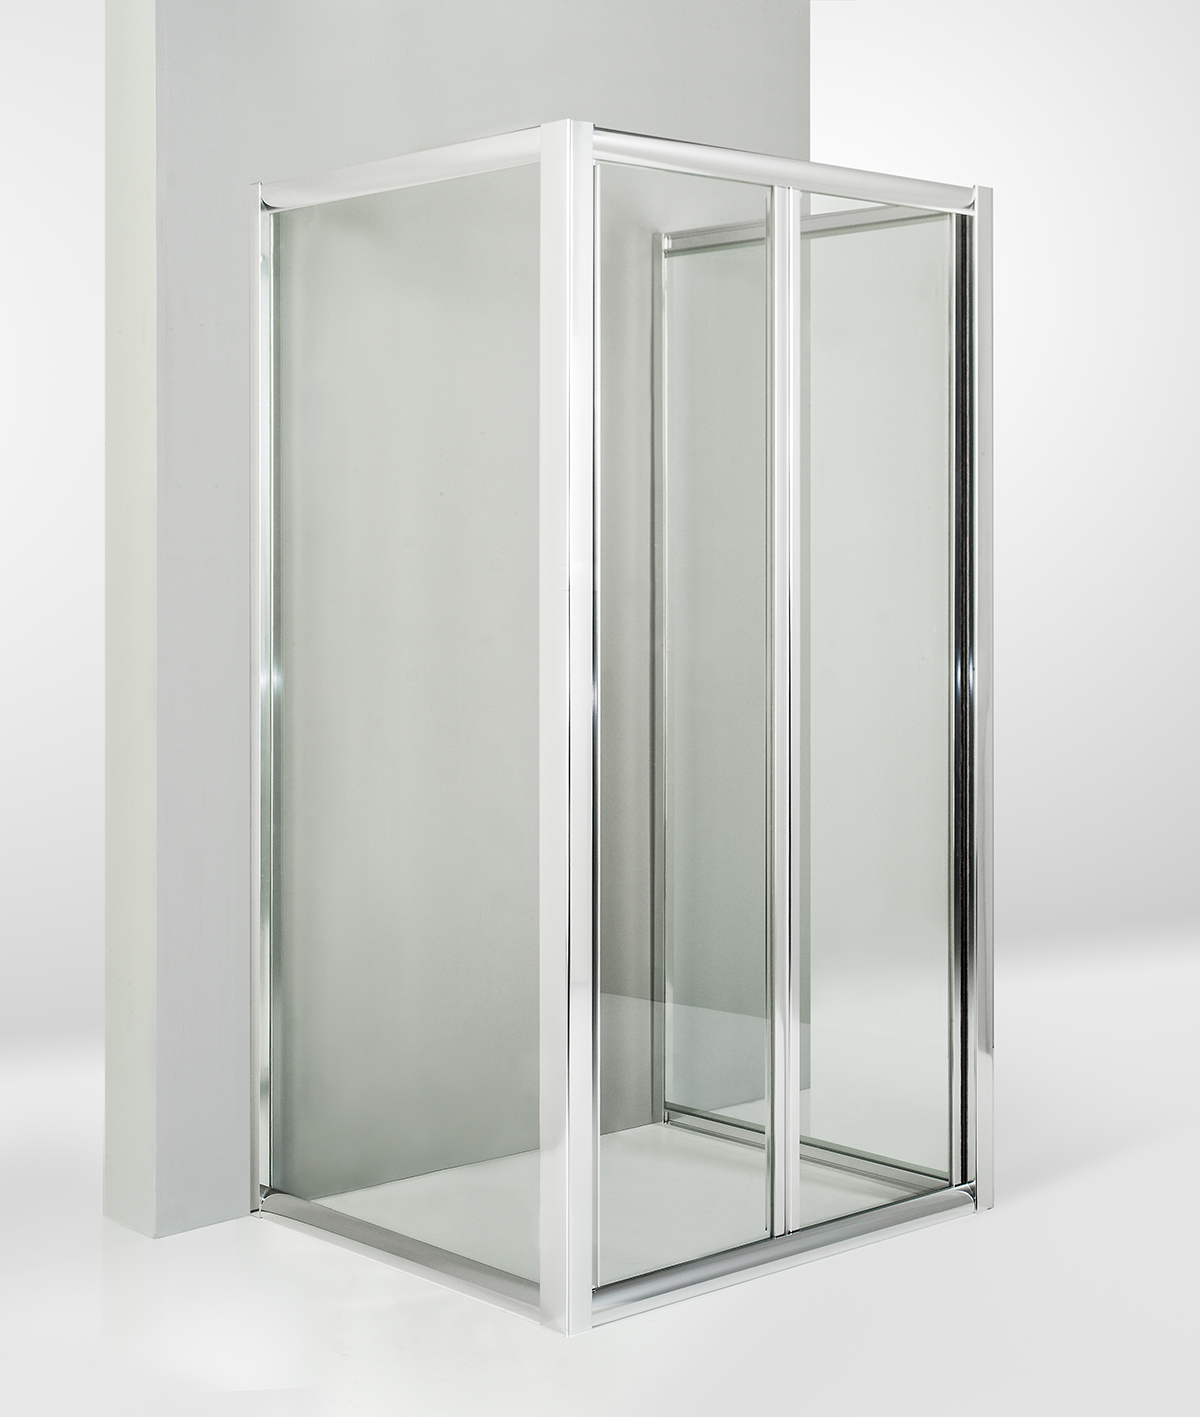 Faszinierend Badmöbel Porta Galerie Von Box Doccia 3 Lati Con 2 Ante